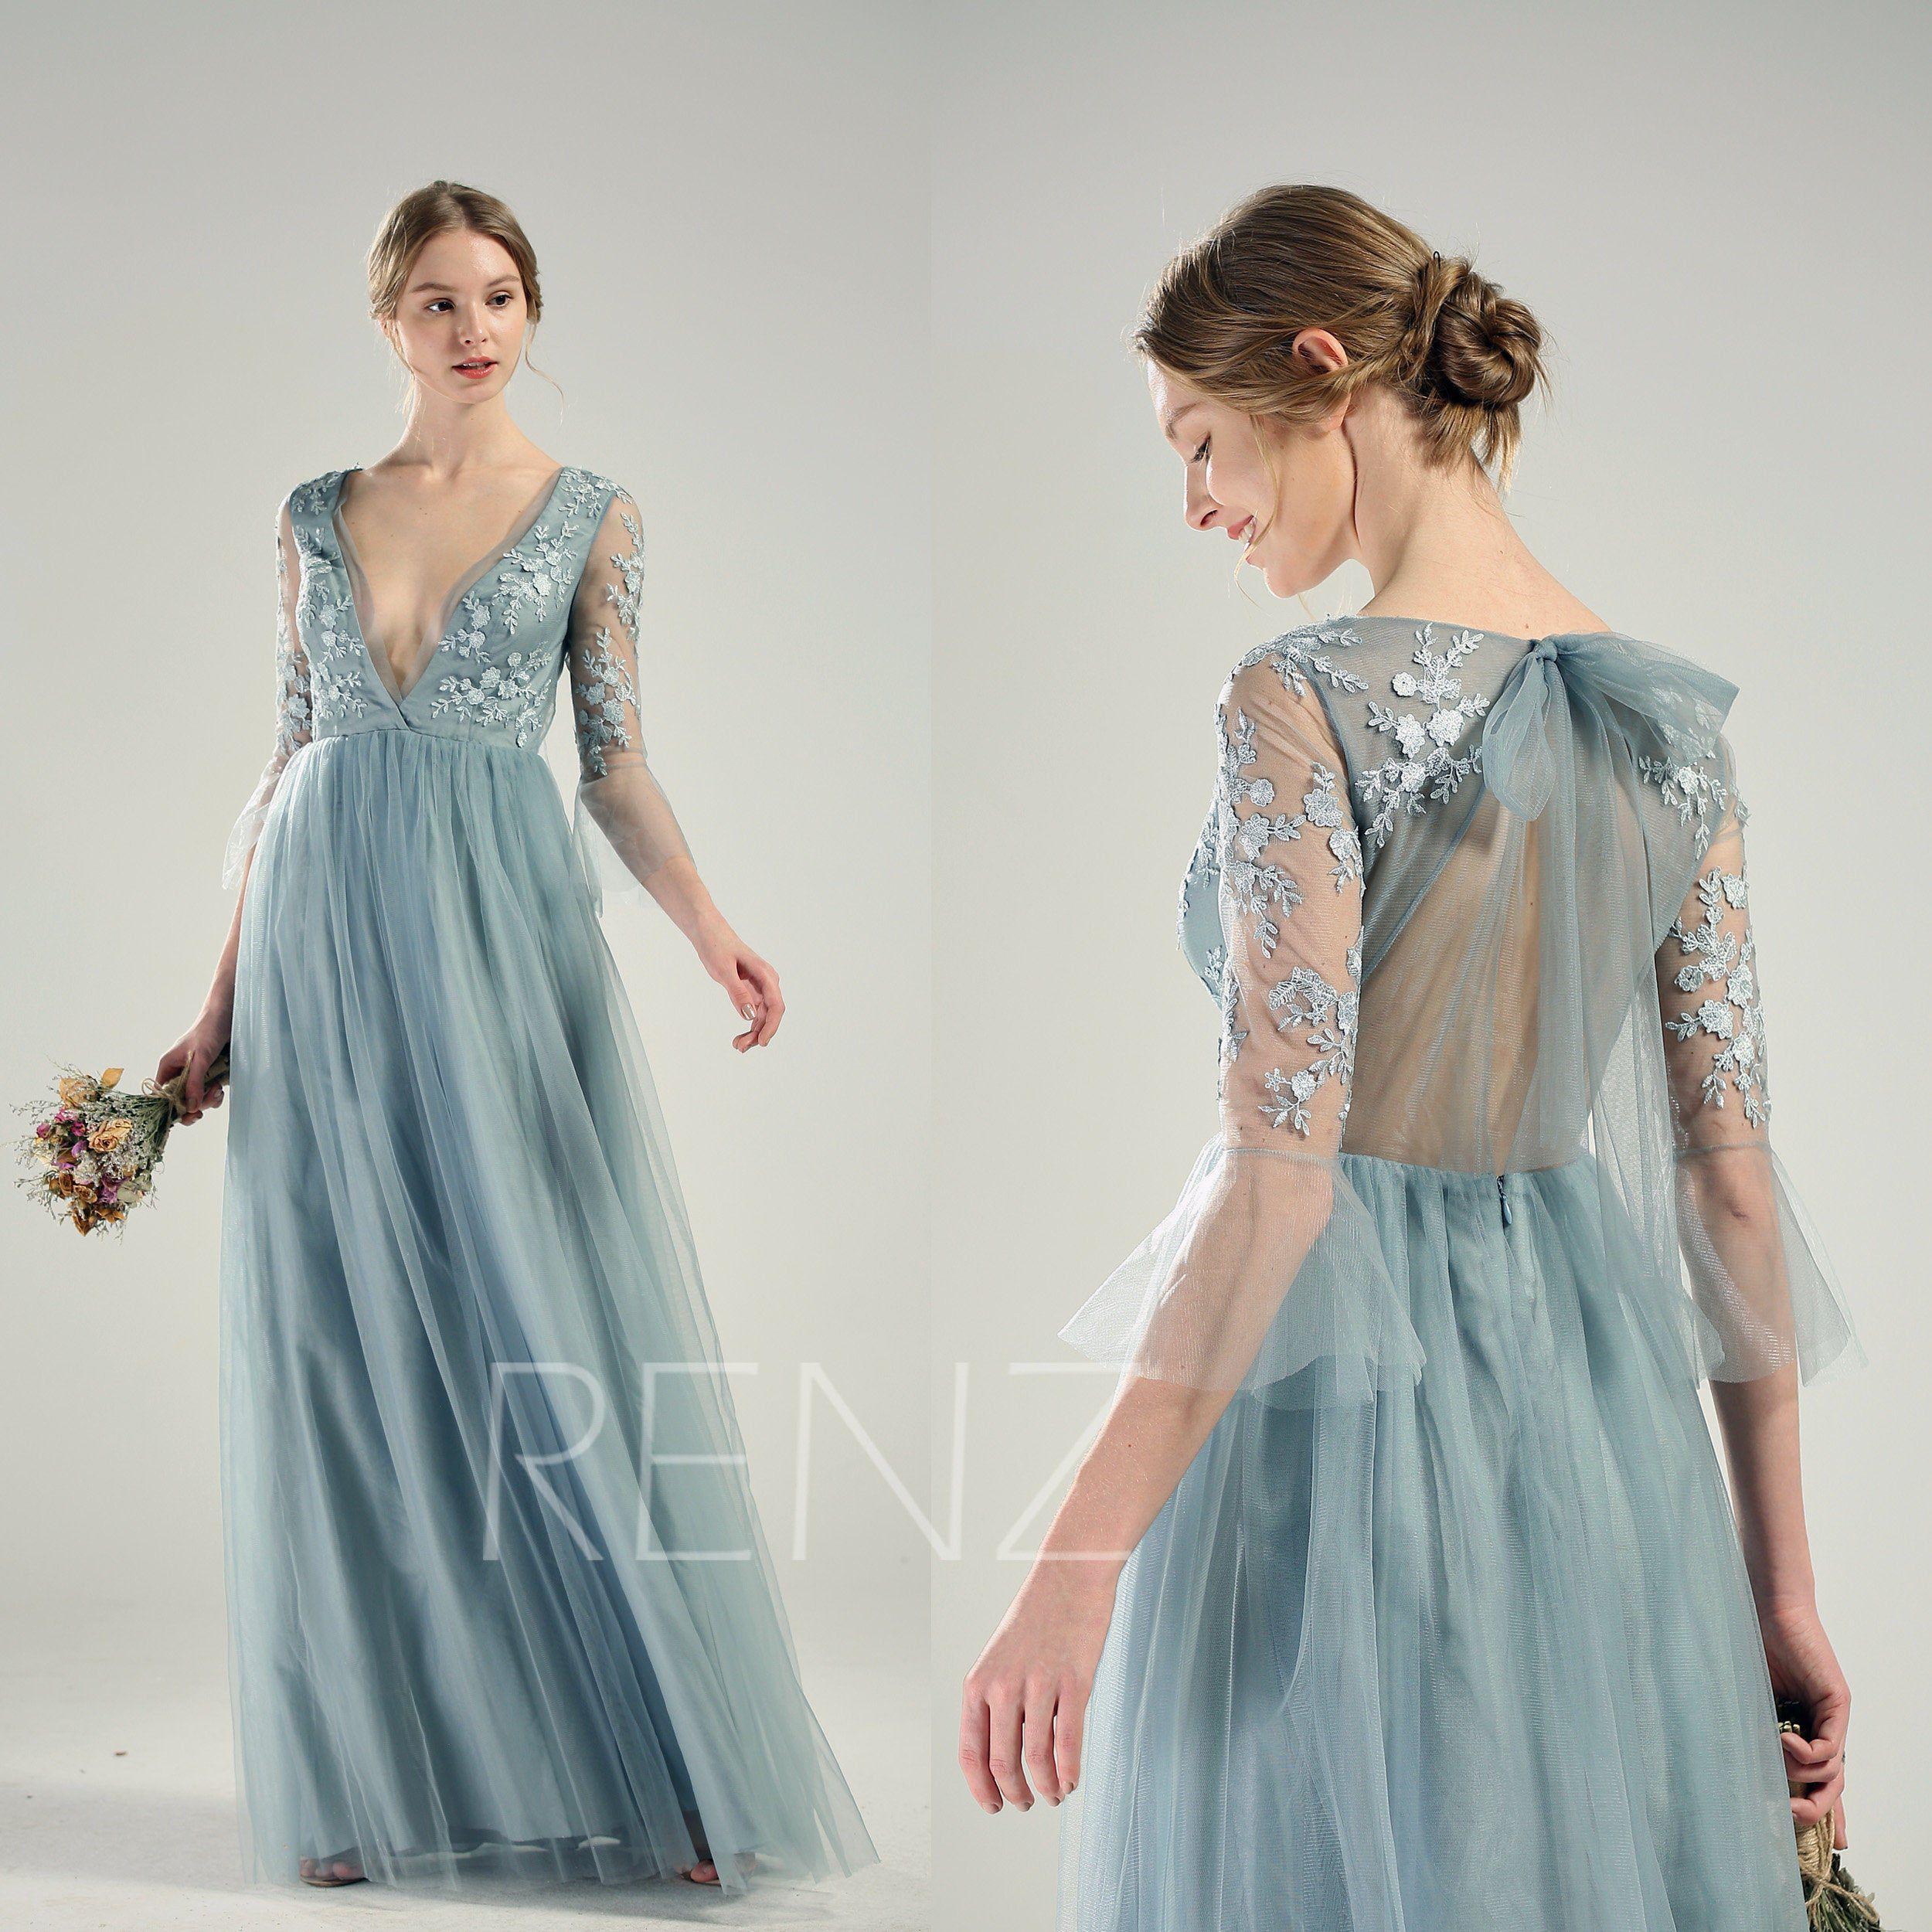 Blue Wedding Dress Long Sleeve Dusty Blue Bridesmaid Dress Etsy Dusty Blue Bridesmaid Dresses Wedding Dress Long Sleeve Dresses [ 2500 x 2500 Pixel ]